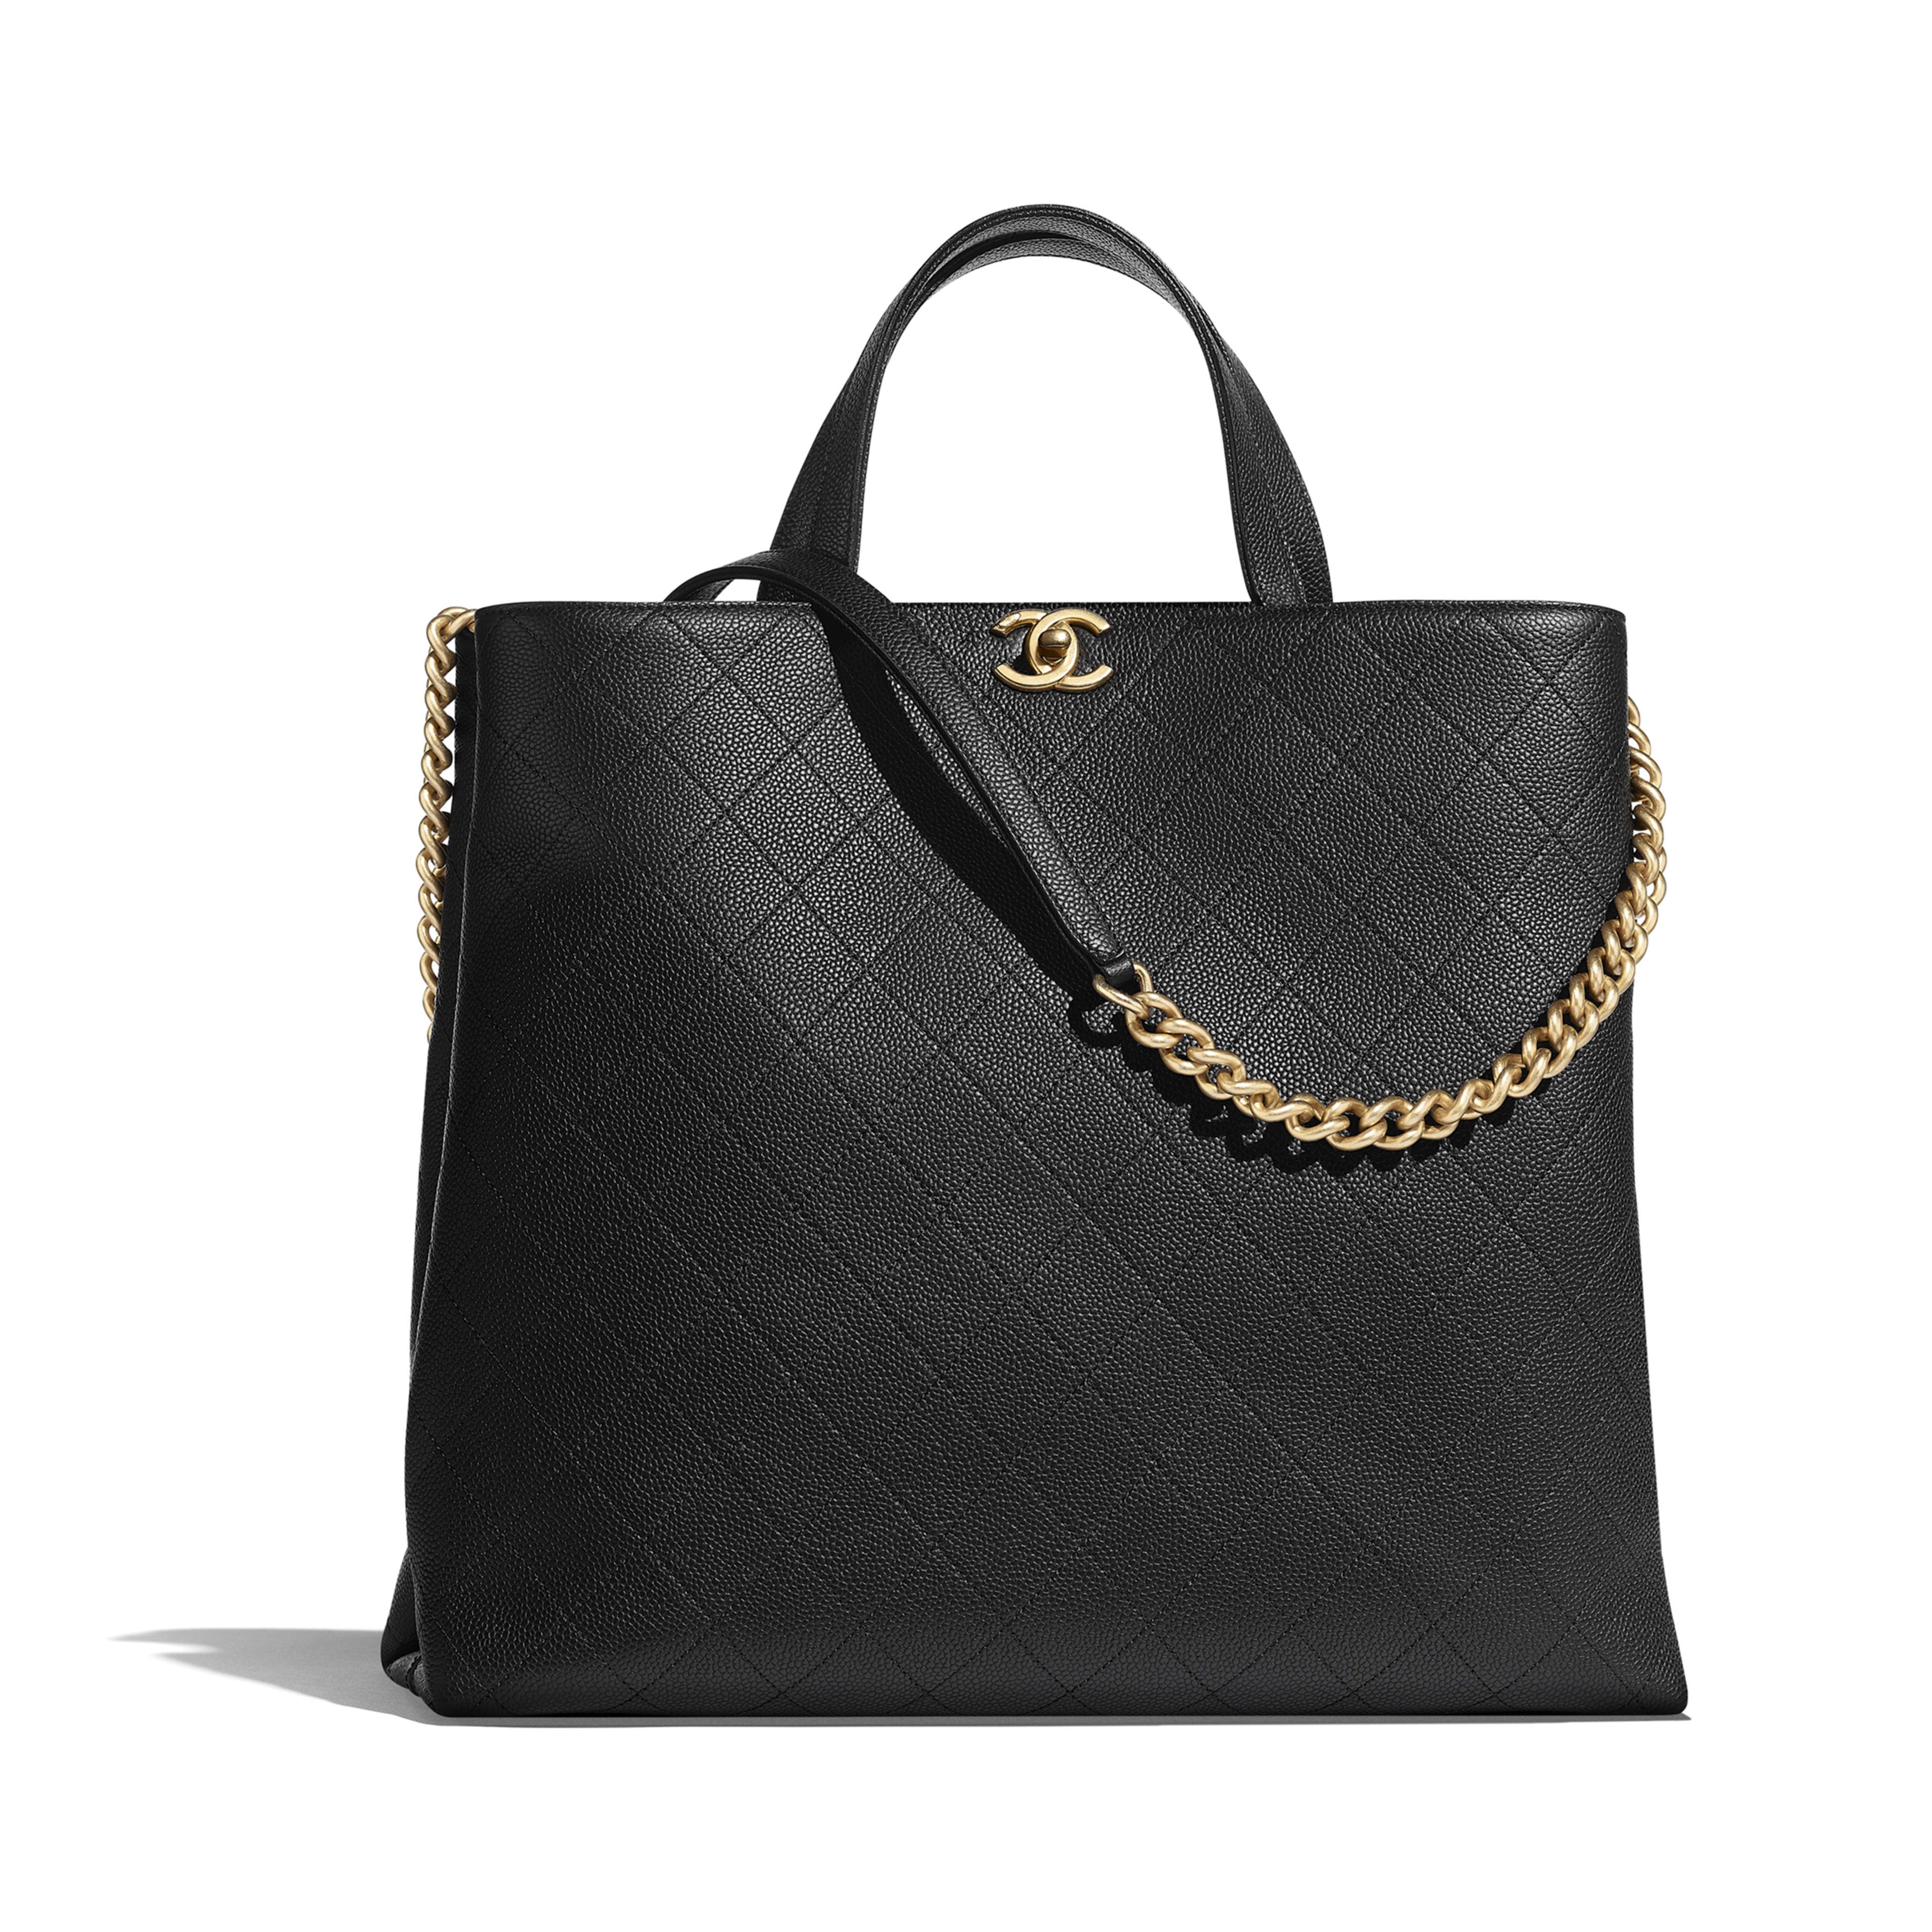 94a0c96d59 Large Shopping Bag - Black - Grained Calfskin   Gold-Tone Metal - Default  view ...